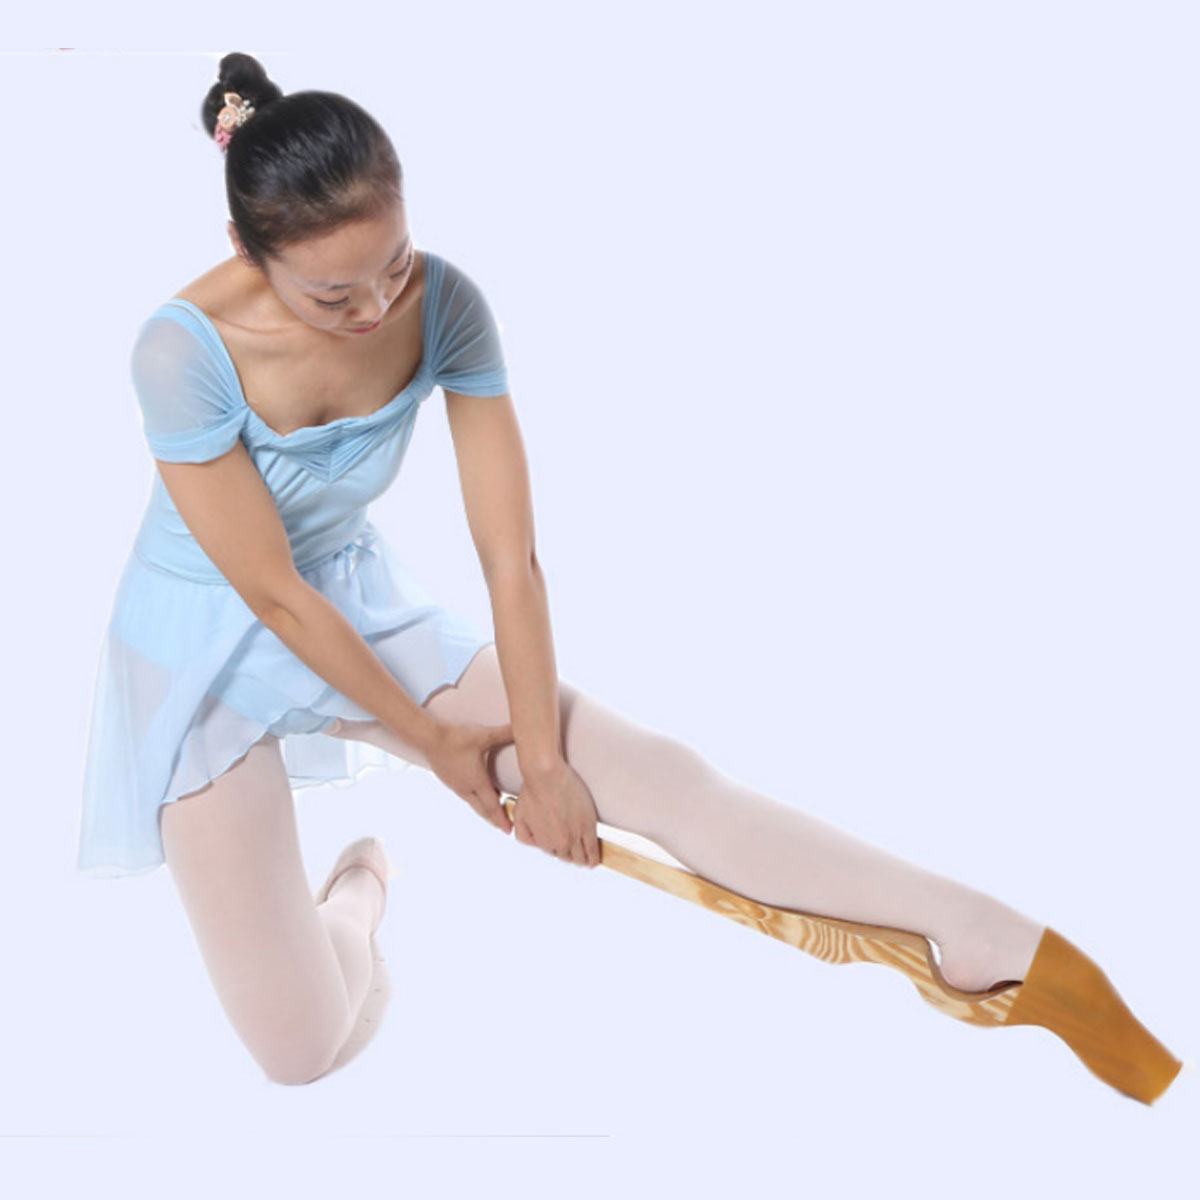 Wood Ballet Foot Stretcher Arch Enhancer Dance Gymnastics Elastic Band Exercise Tools